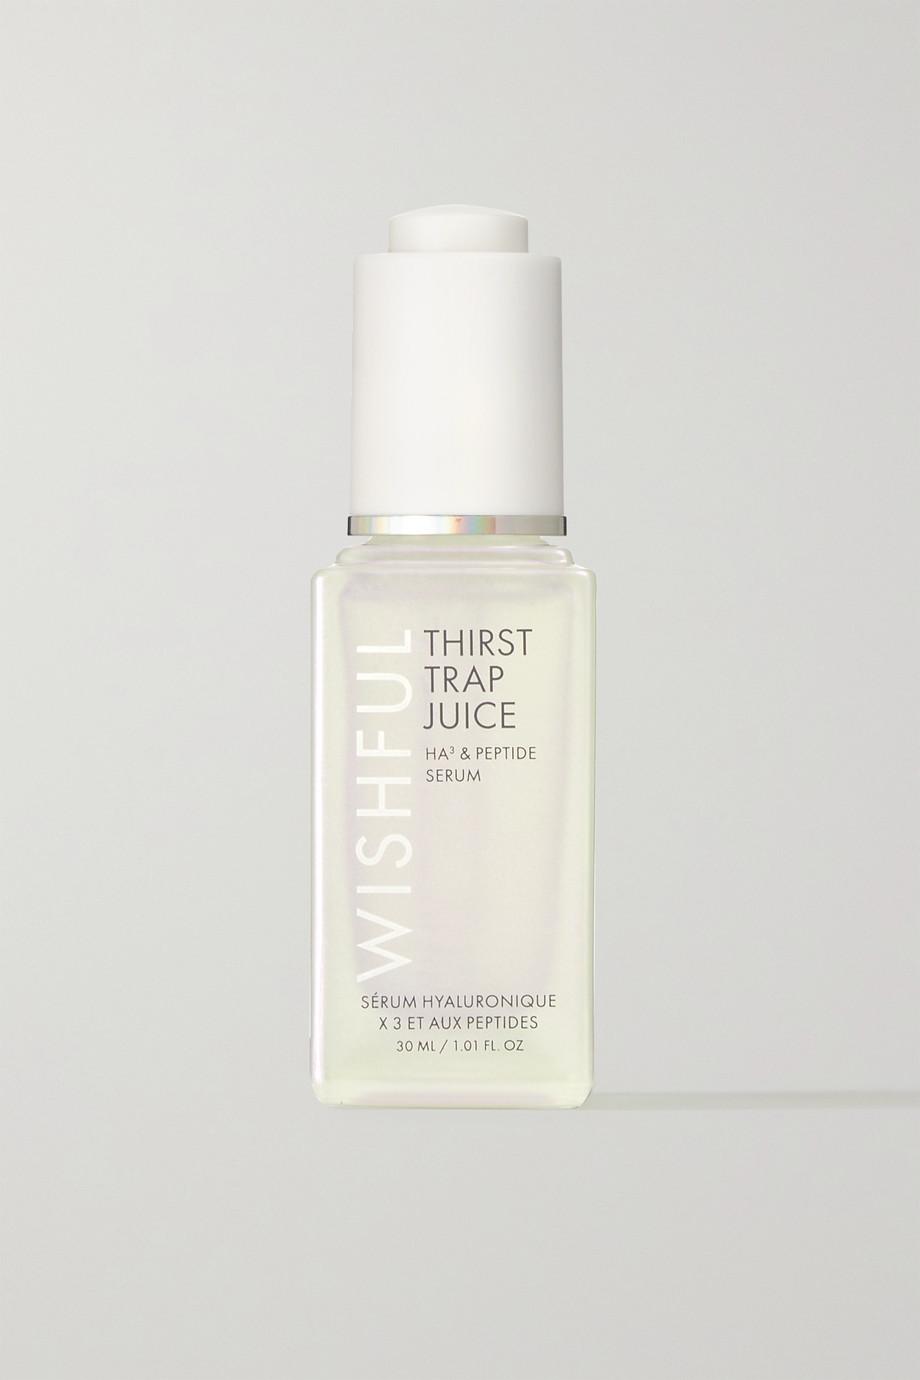 Huda Beauty Wishful Thirst Trap Juice Serum, 30ml